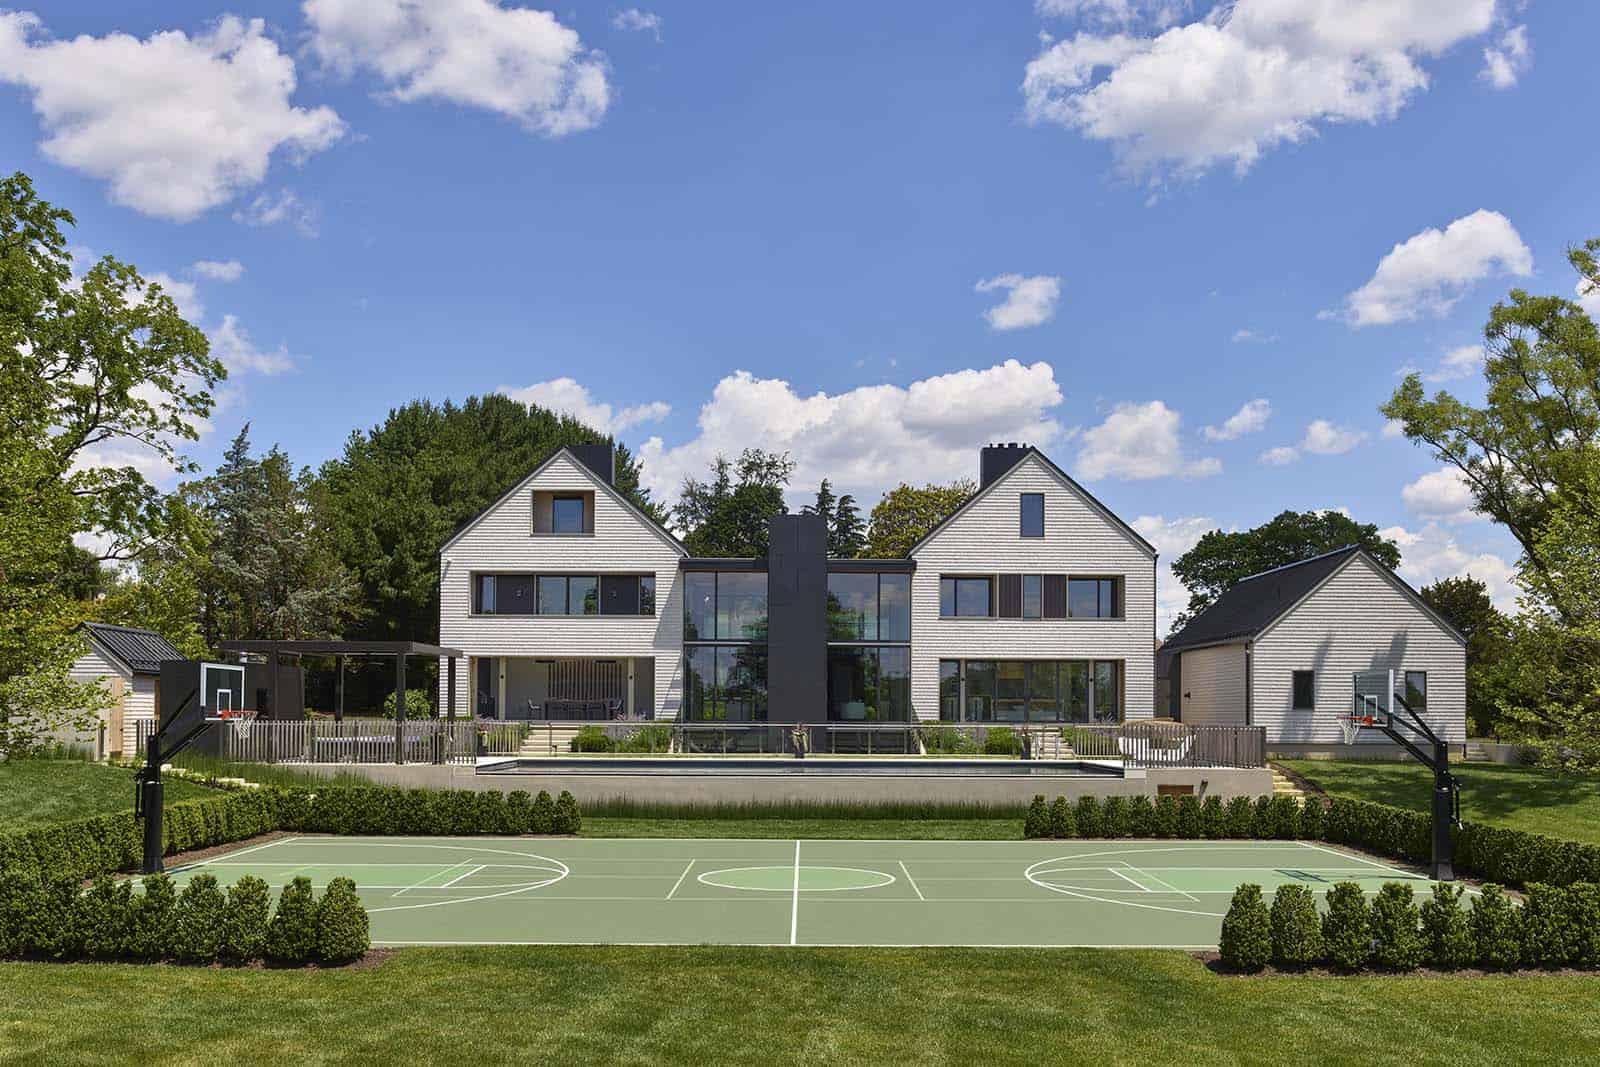 modern-home-exterior-with-a-tennis-court